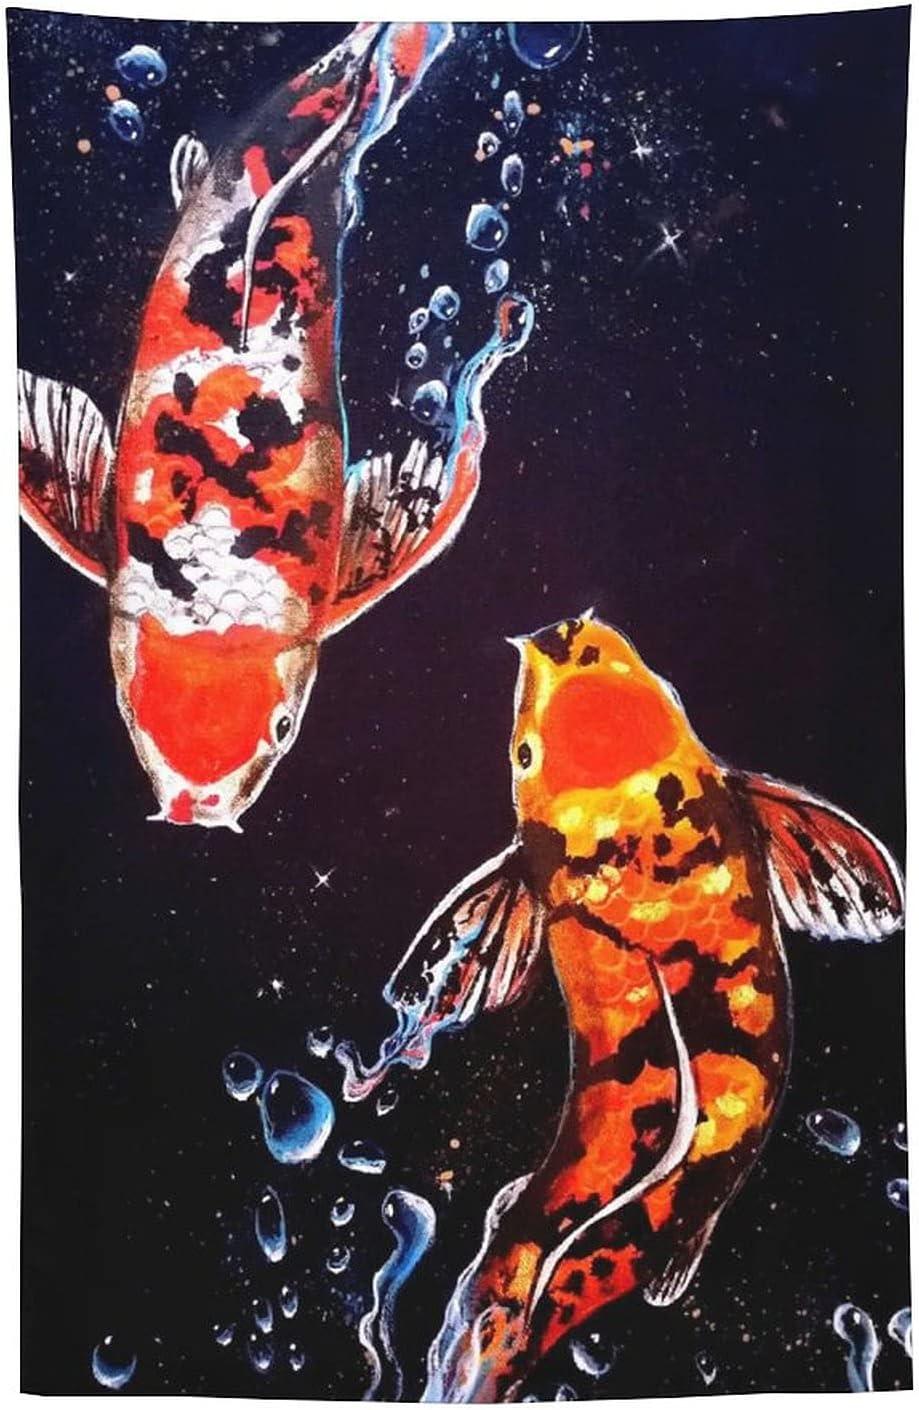 XYEHBNR Crap Fish Swimming Water Watercolor Sea All items free Translated shipping Studio Ro Animal